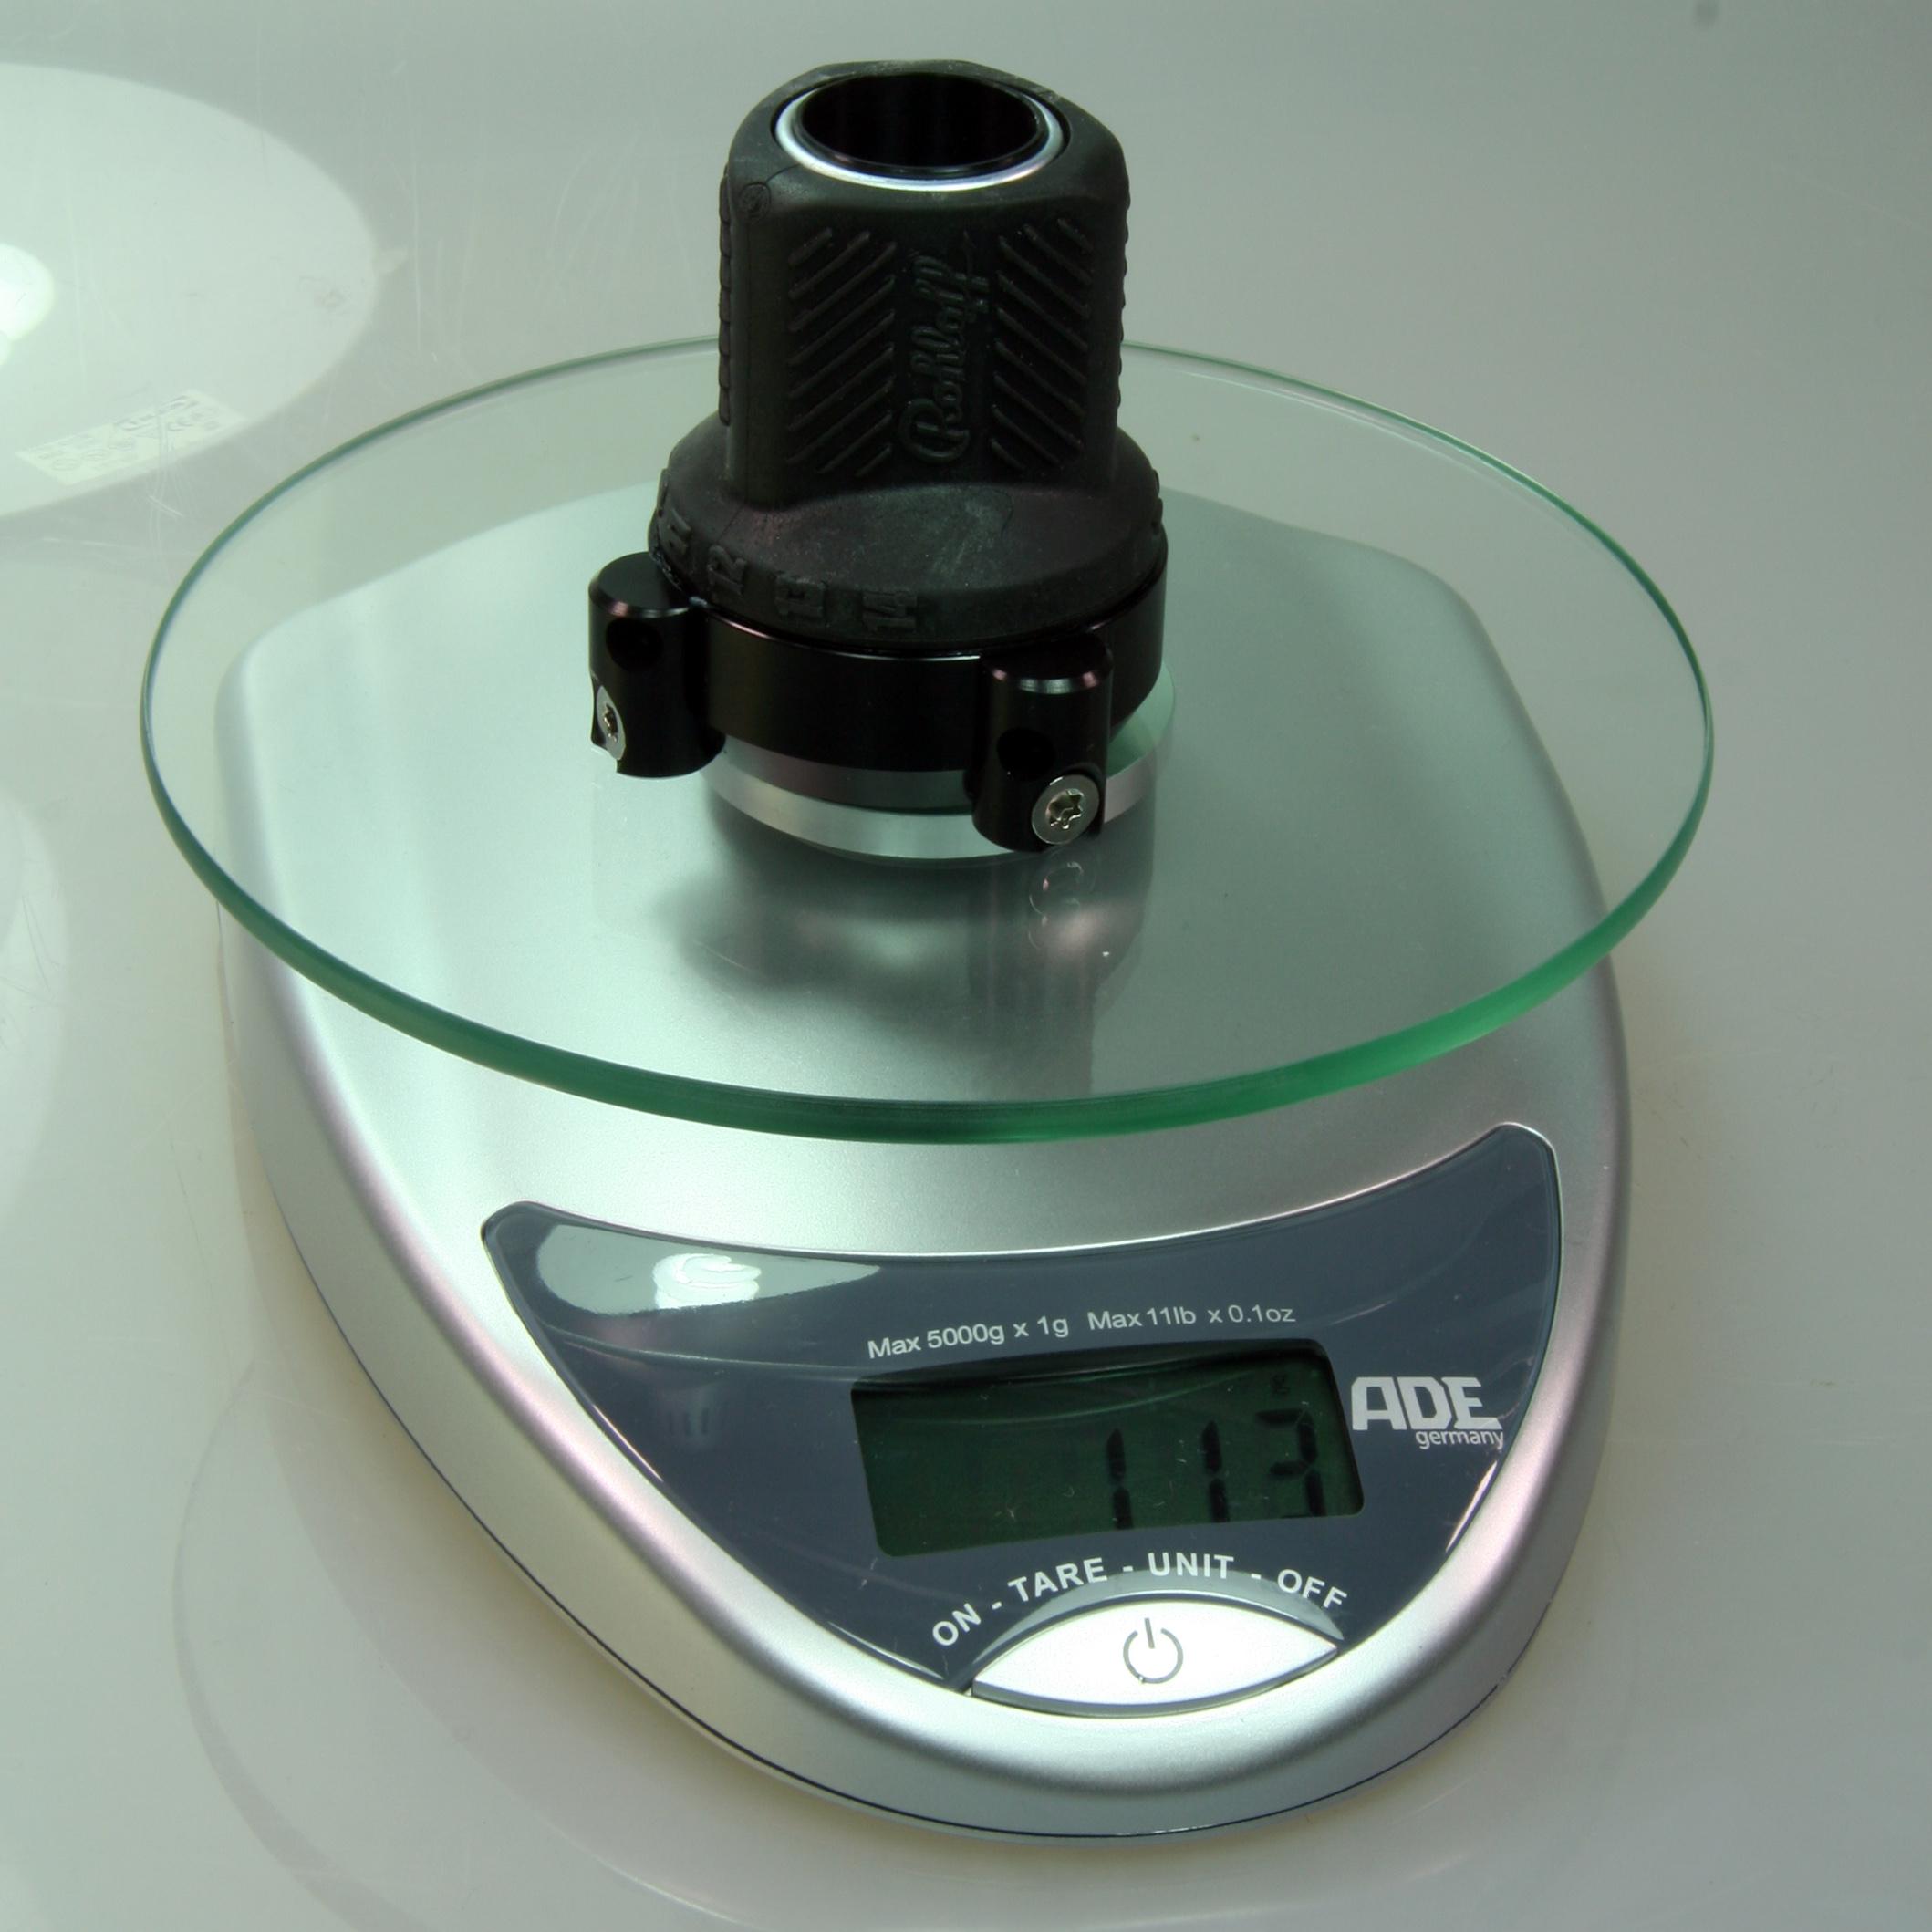 Nabenvergleich-rohloff-speedhub-shimano-alfine-11.jpg